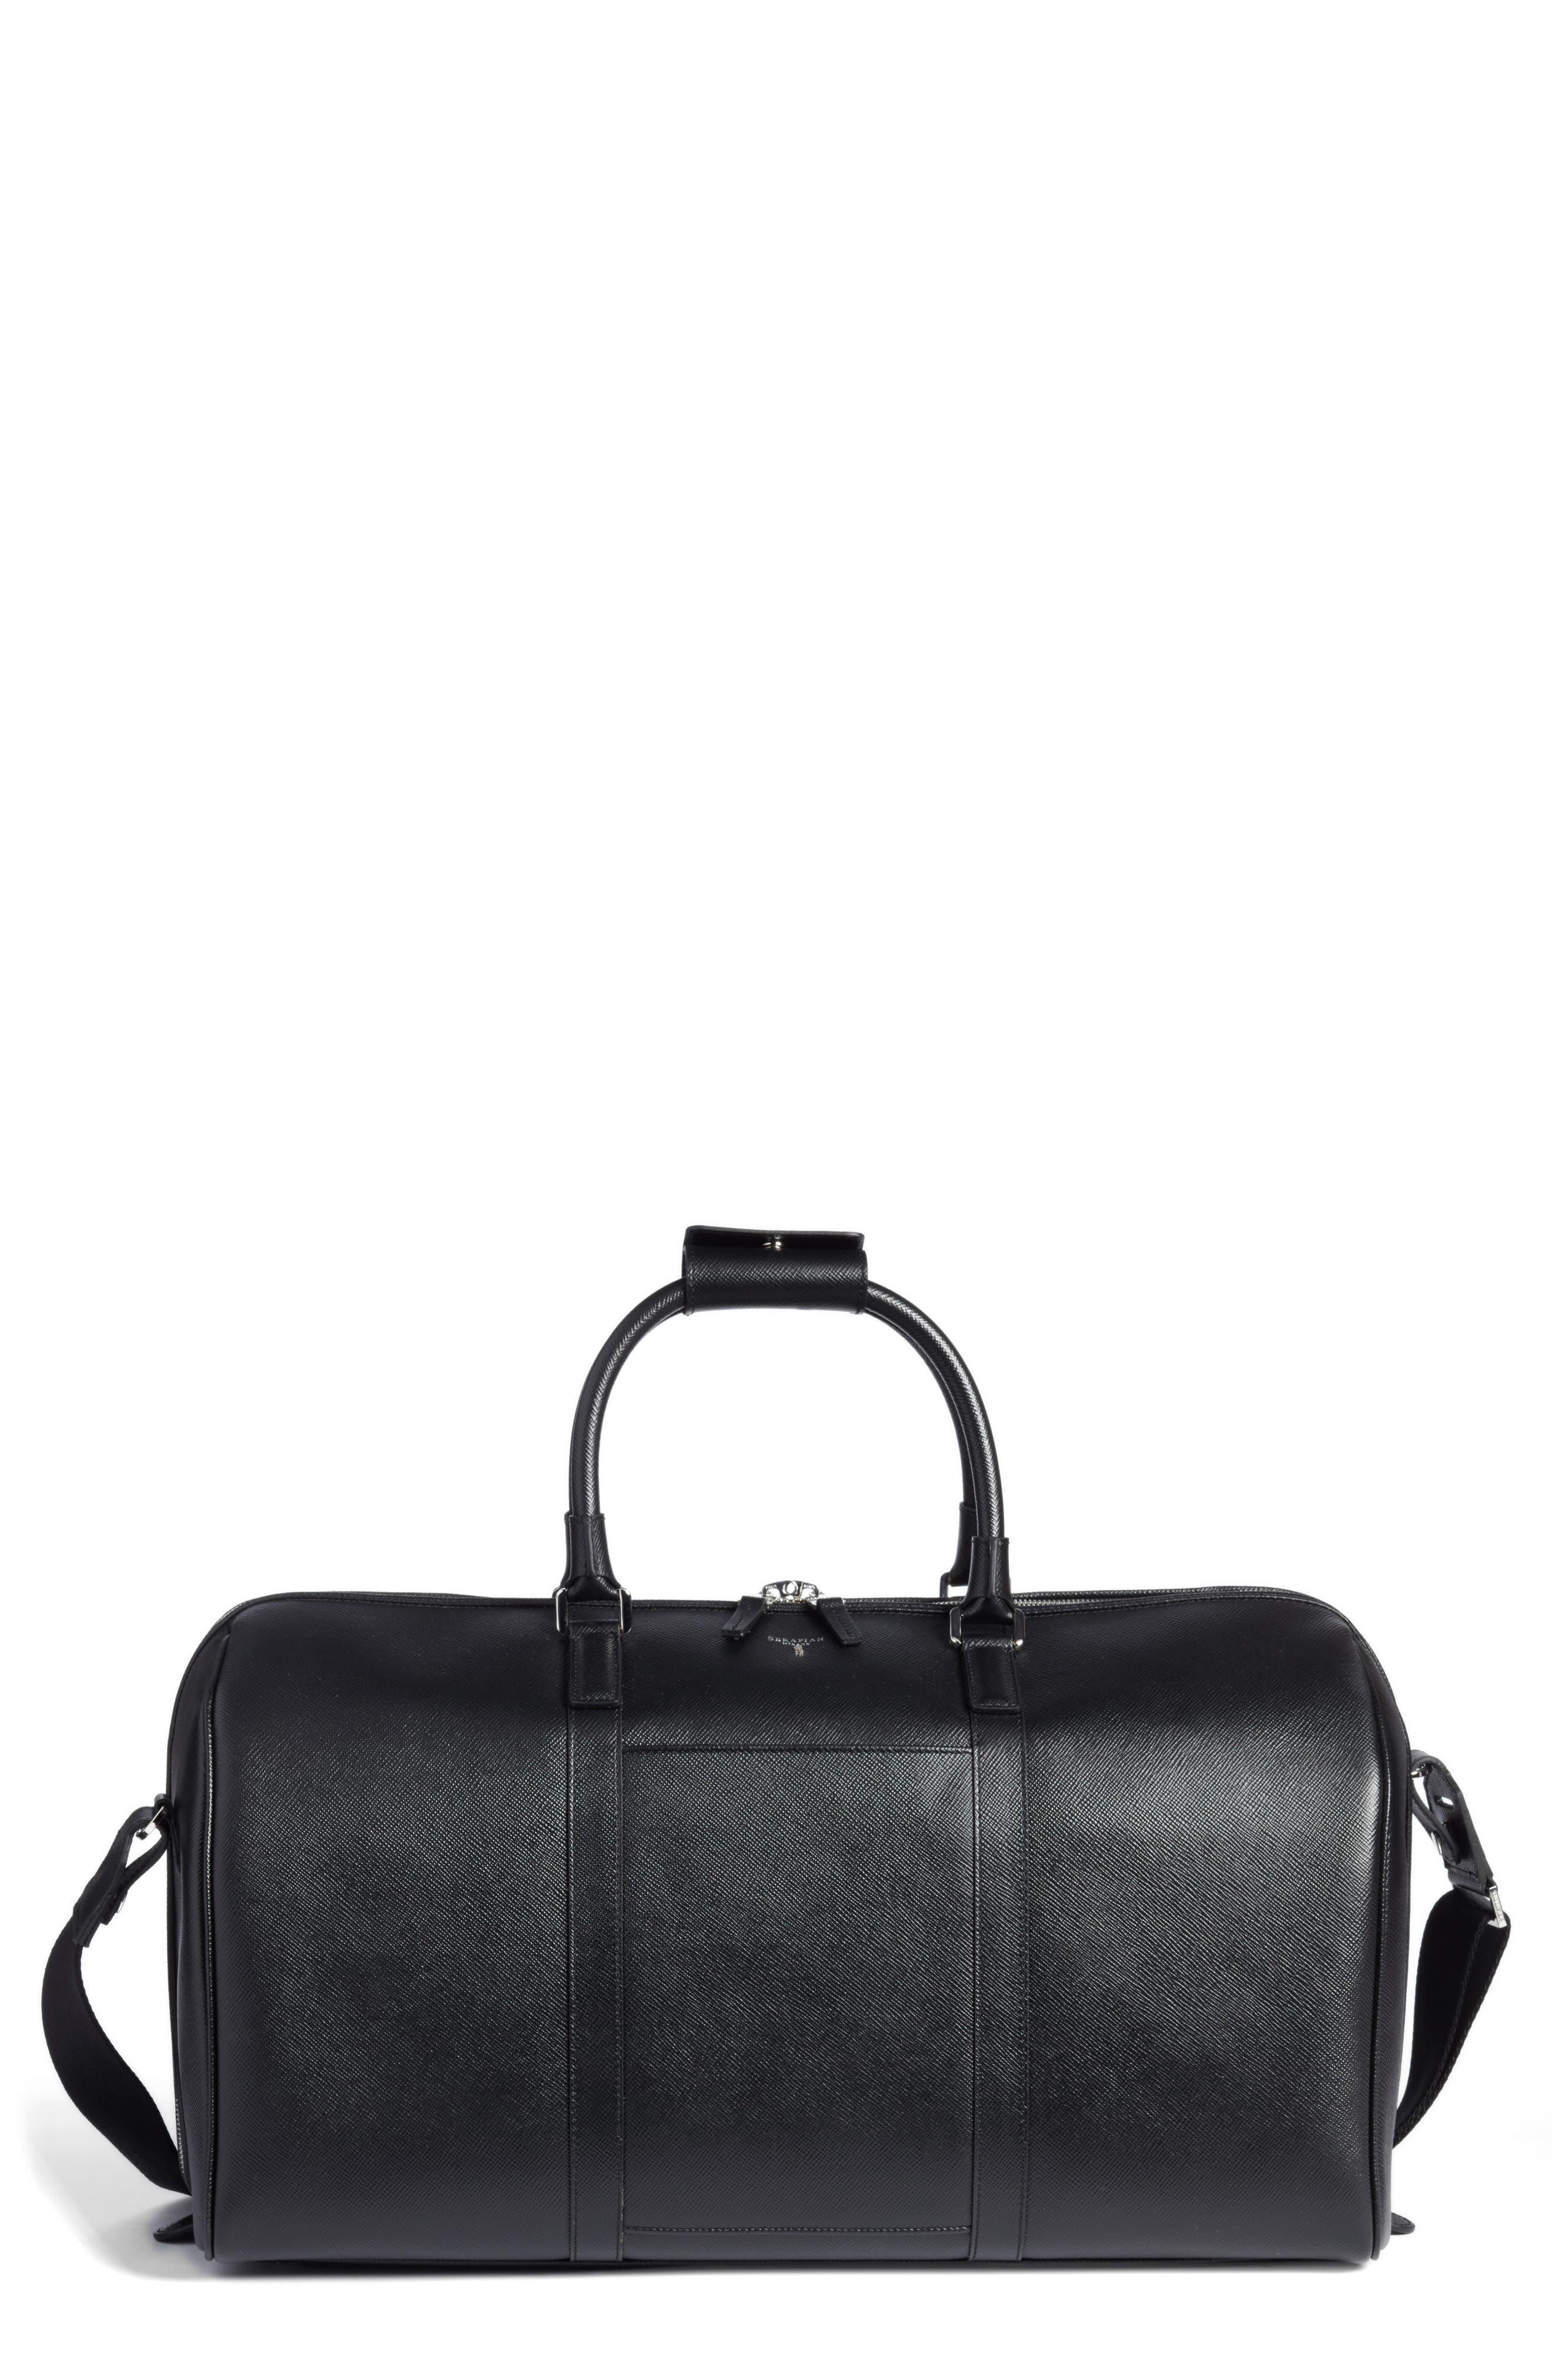 Serapian Milano Small Holdall Evolution Leather Satchel